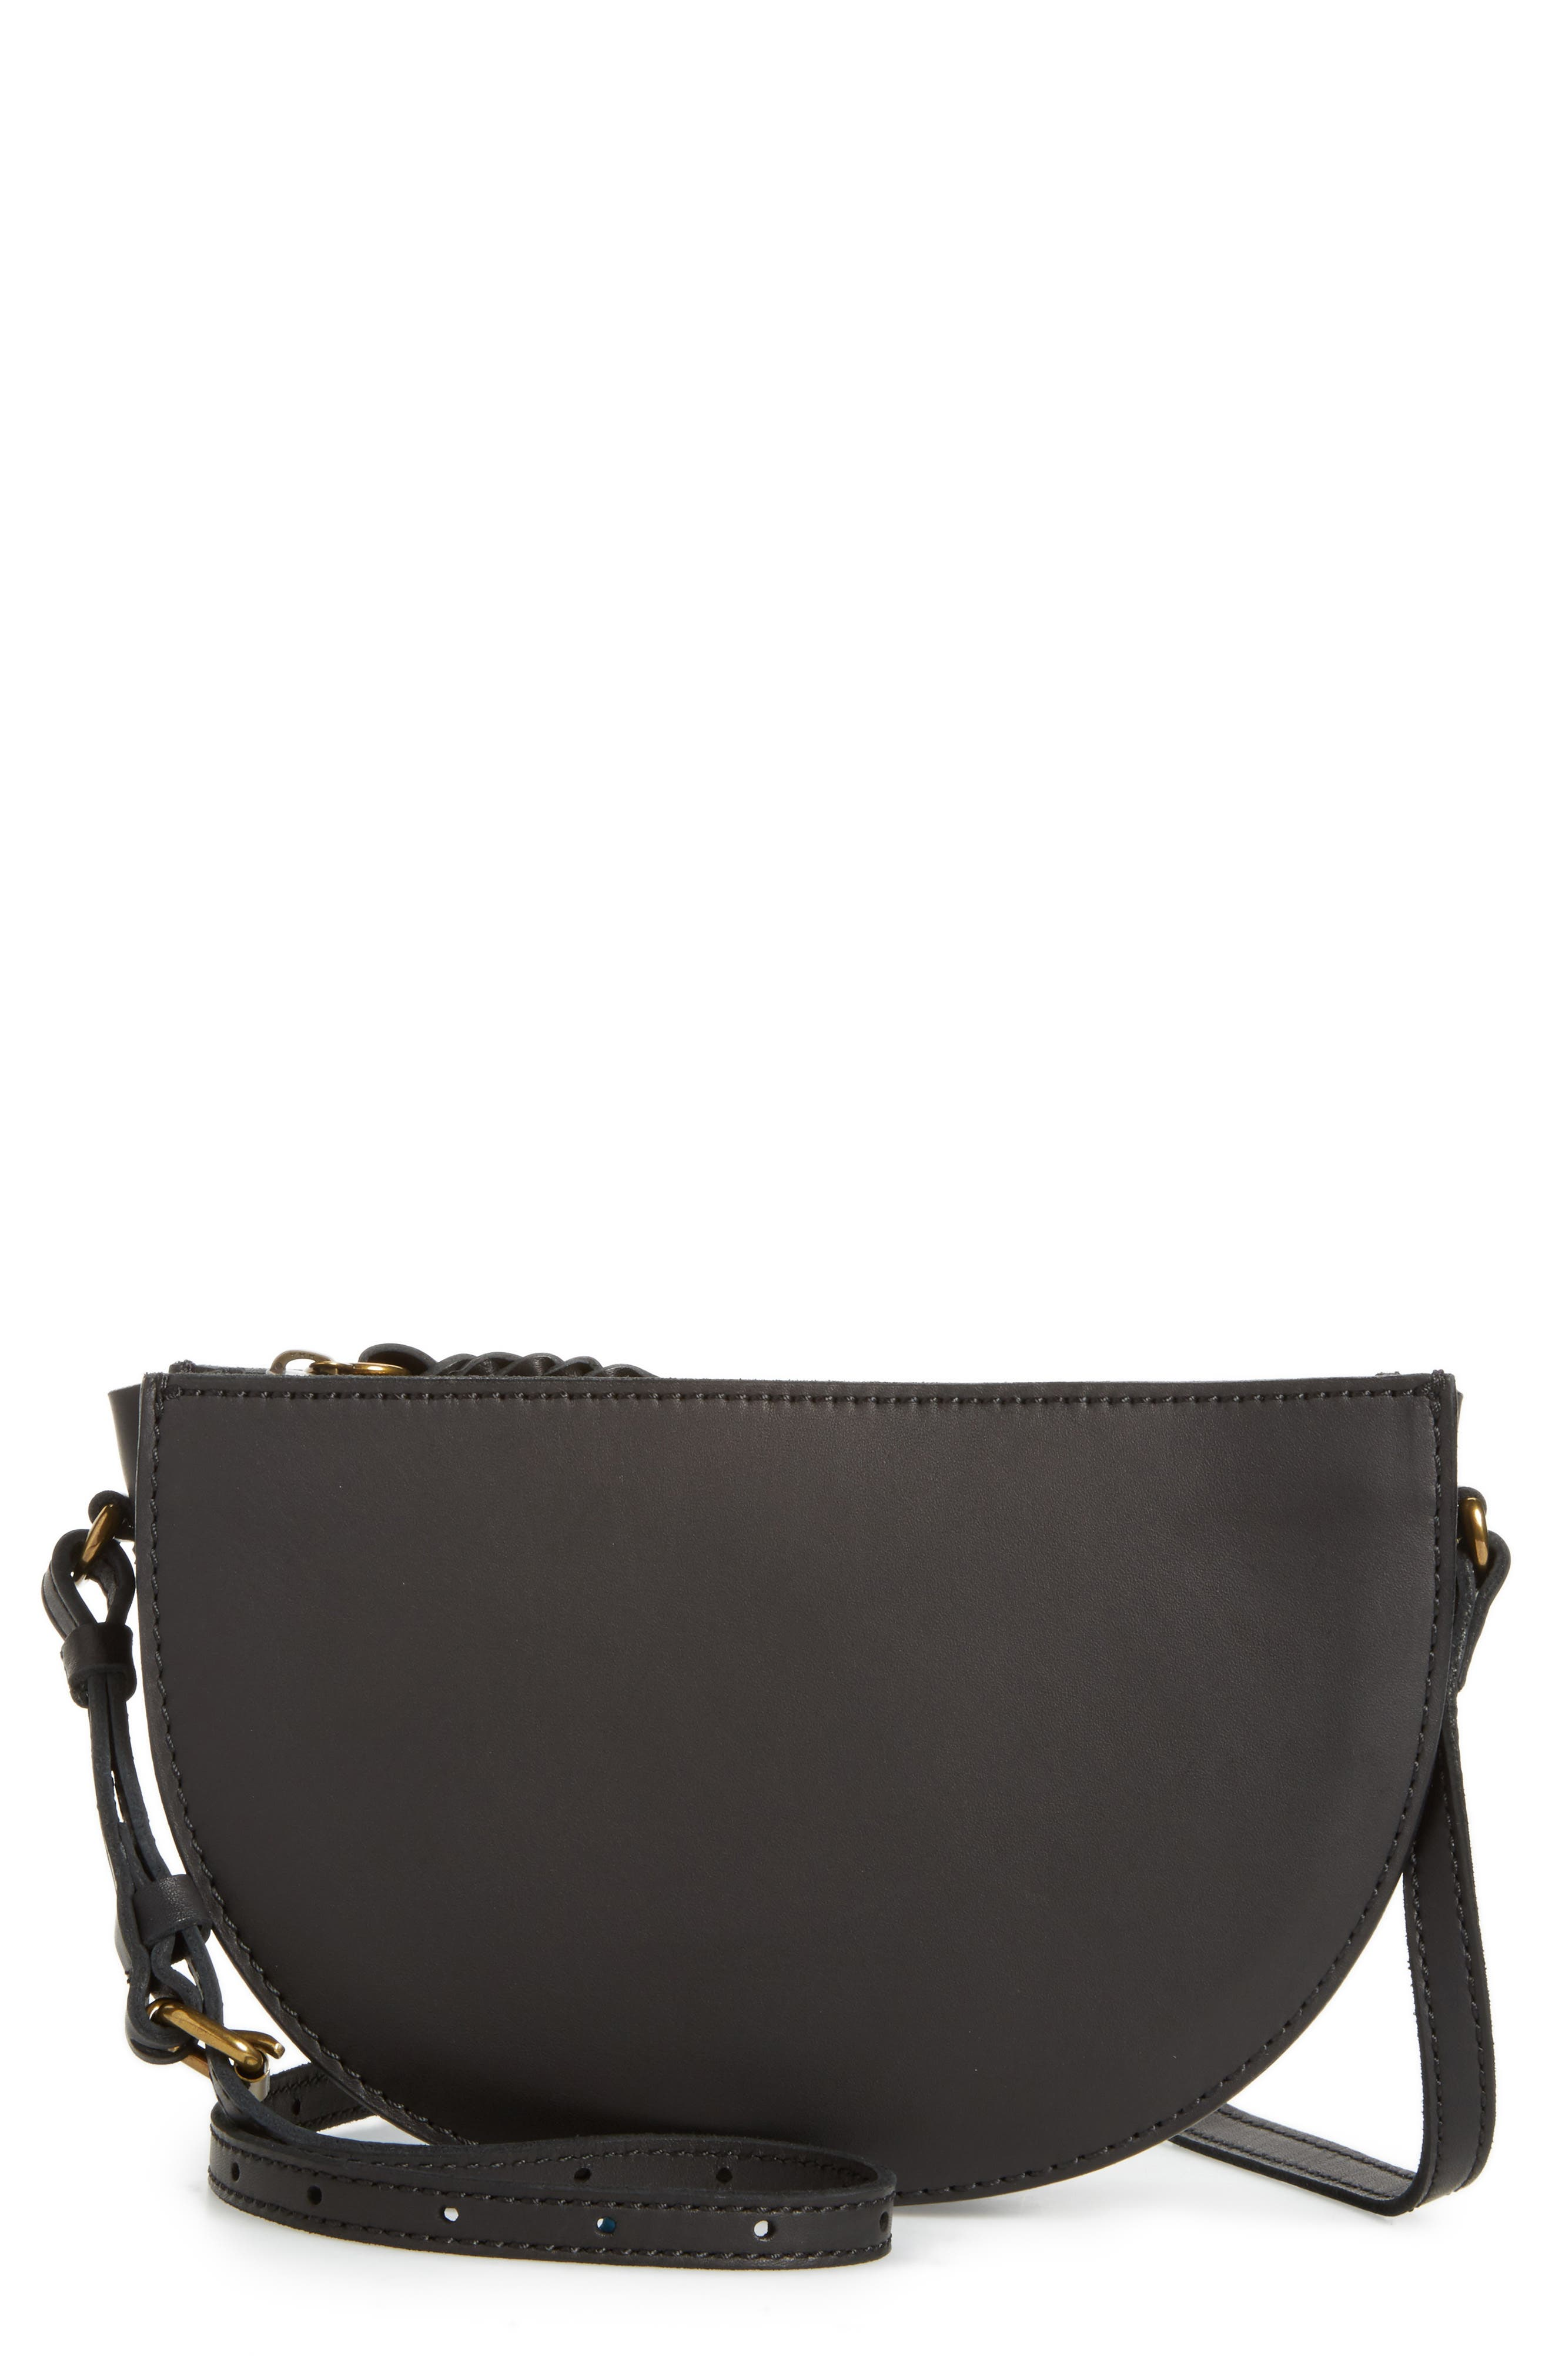 Juniper Vachetta Leather Half Moon Crossbody Bag,                             Main thumbnail 1, color,                             001